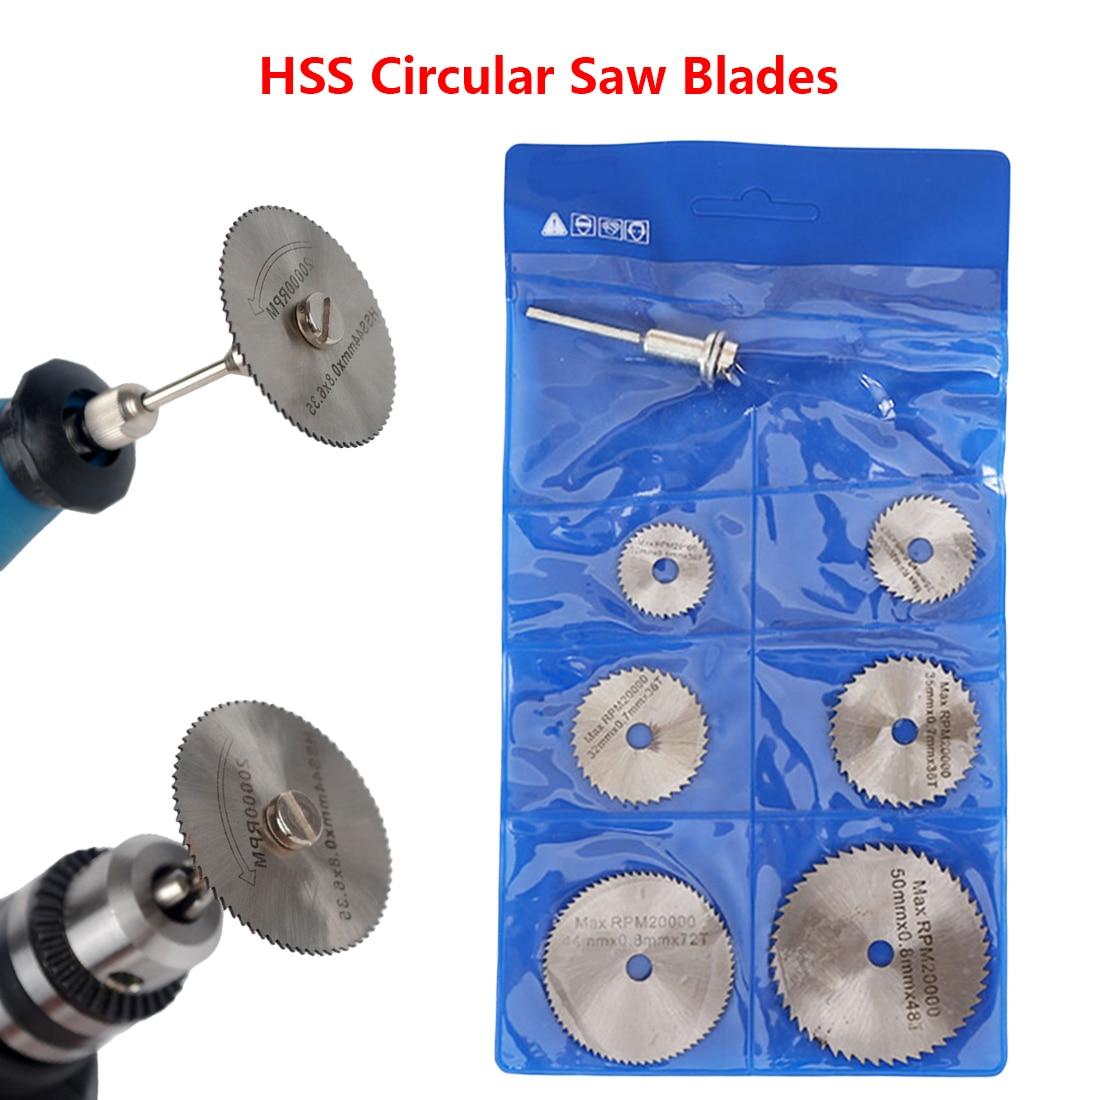 7 Pcs HSS Rotary Tools Circular Saw Blades Cutting Discs Mandrel Cutoff Cutter Power Tools Multitool